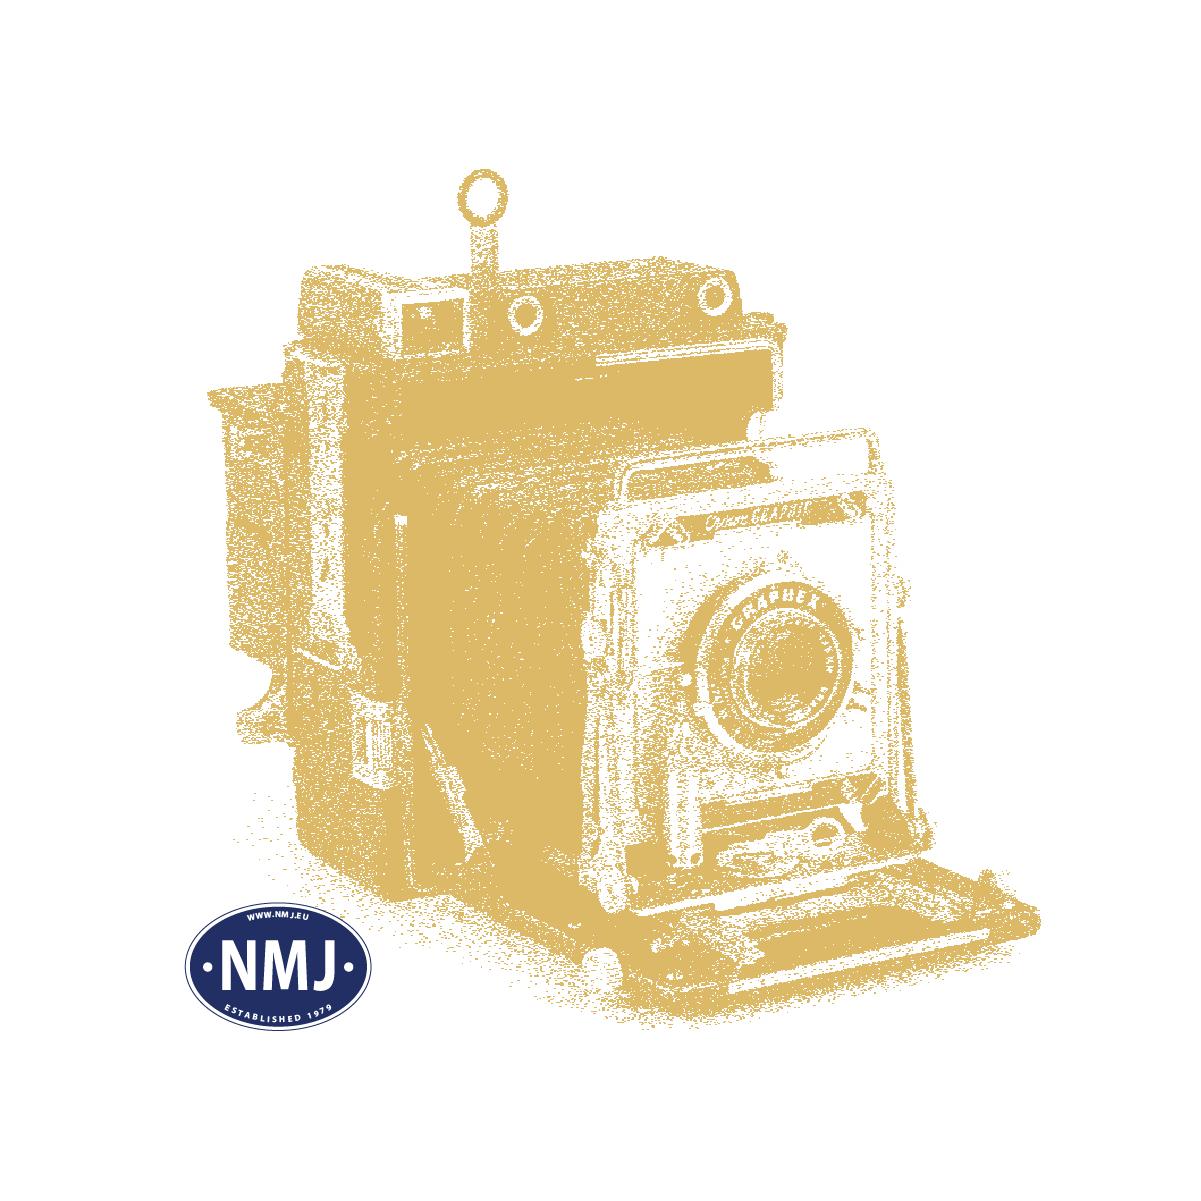 MBR51-2207 - Italienische Pappel Sommer, 12-16cm, TT/H0/0/1